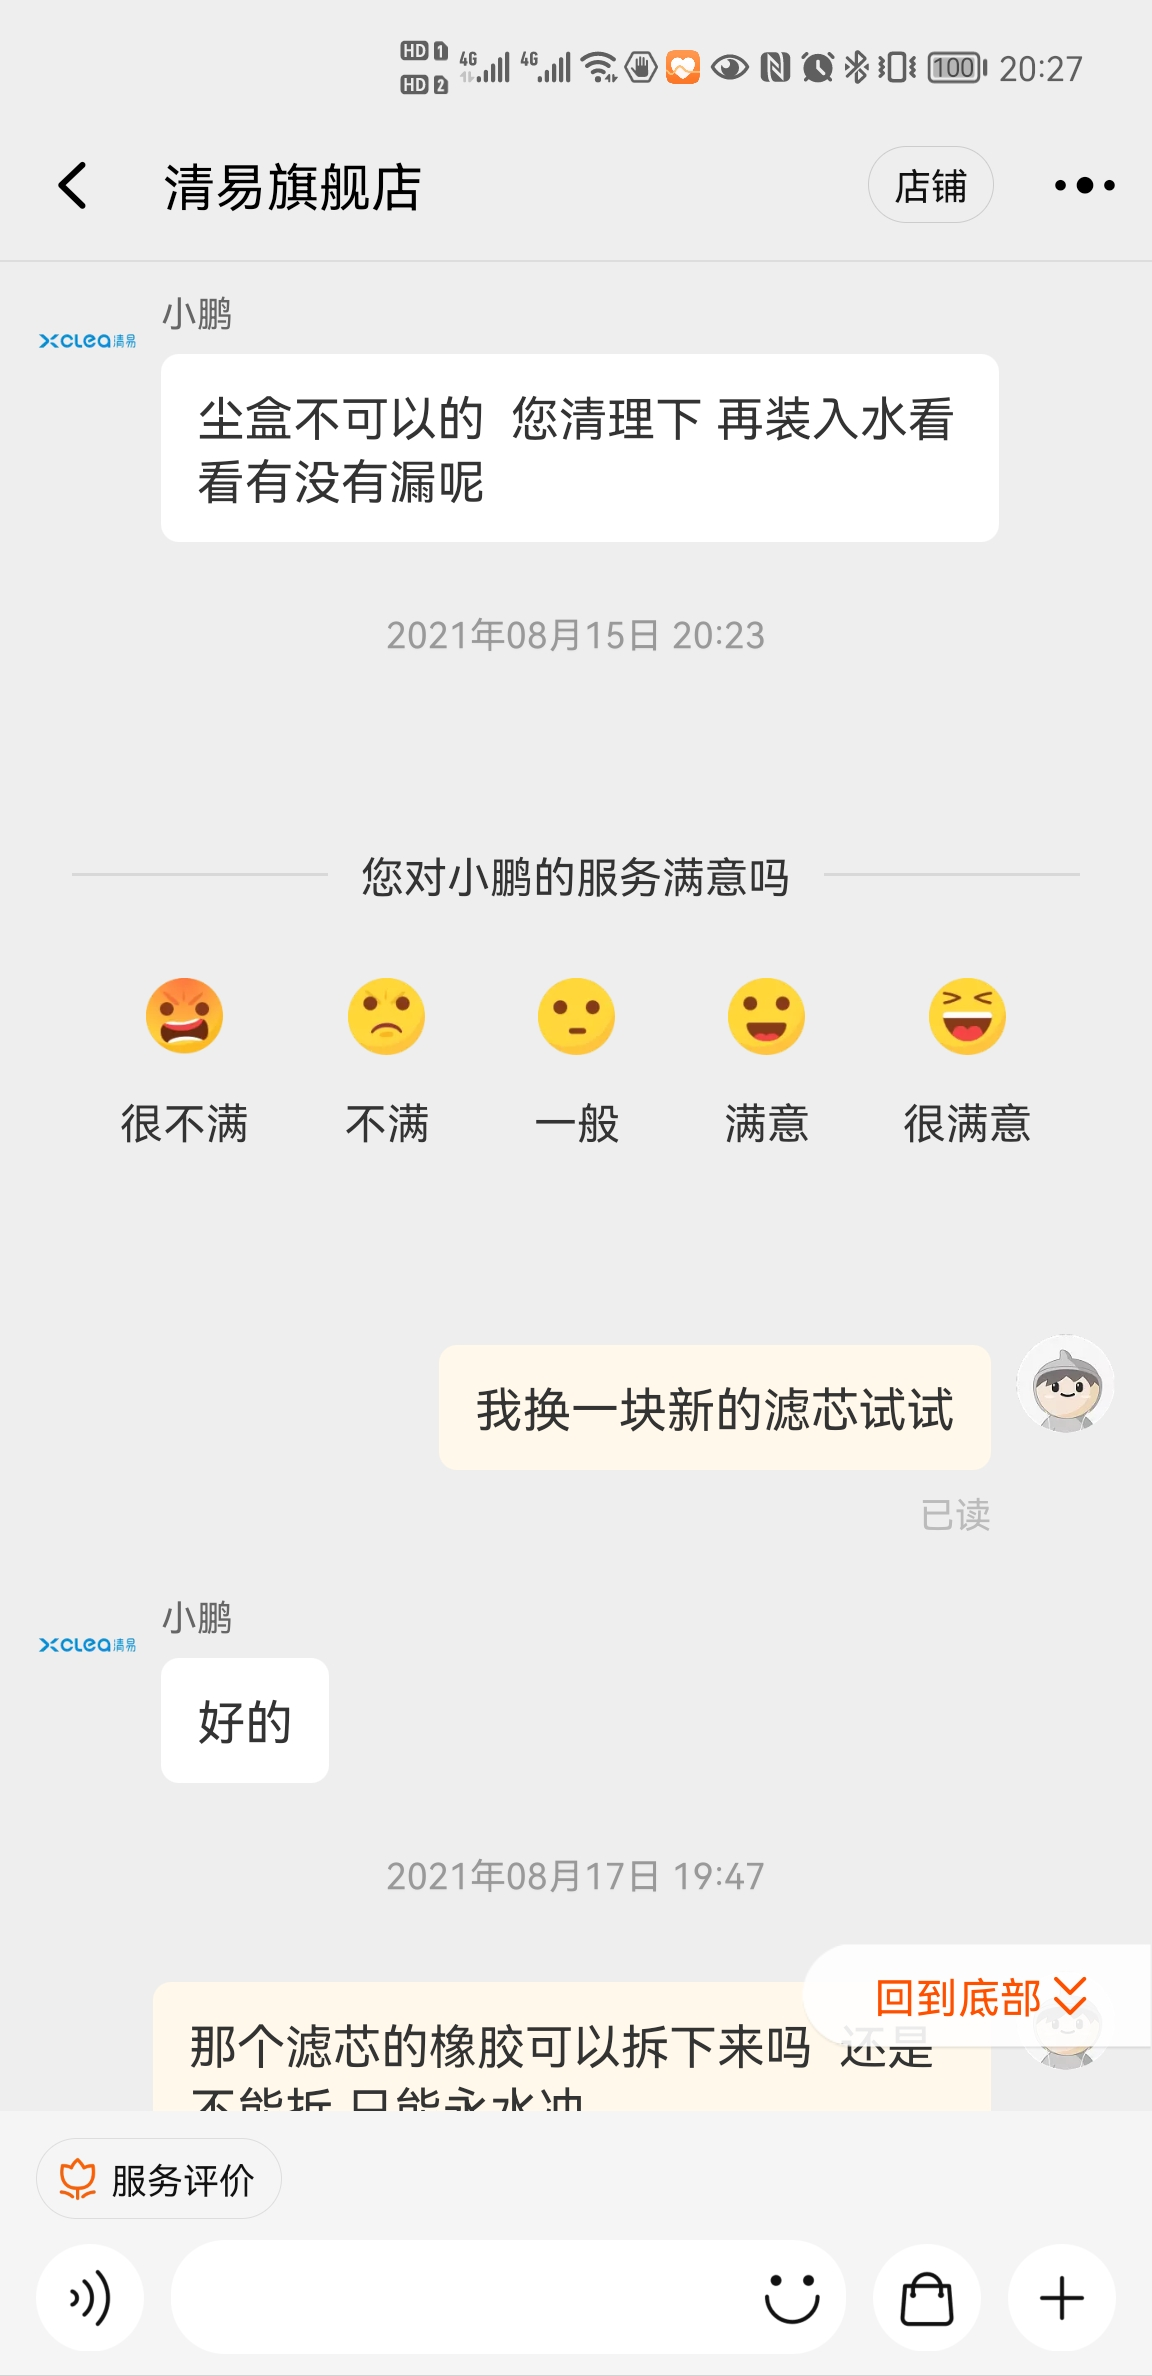 Screenshot_20210903_202732_com.taobao.taobao.jpg